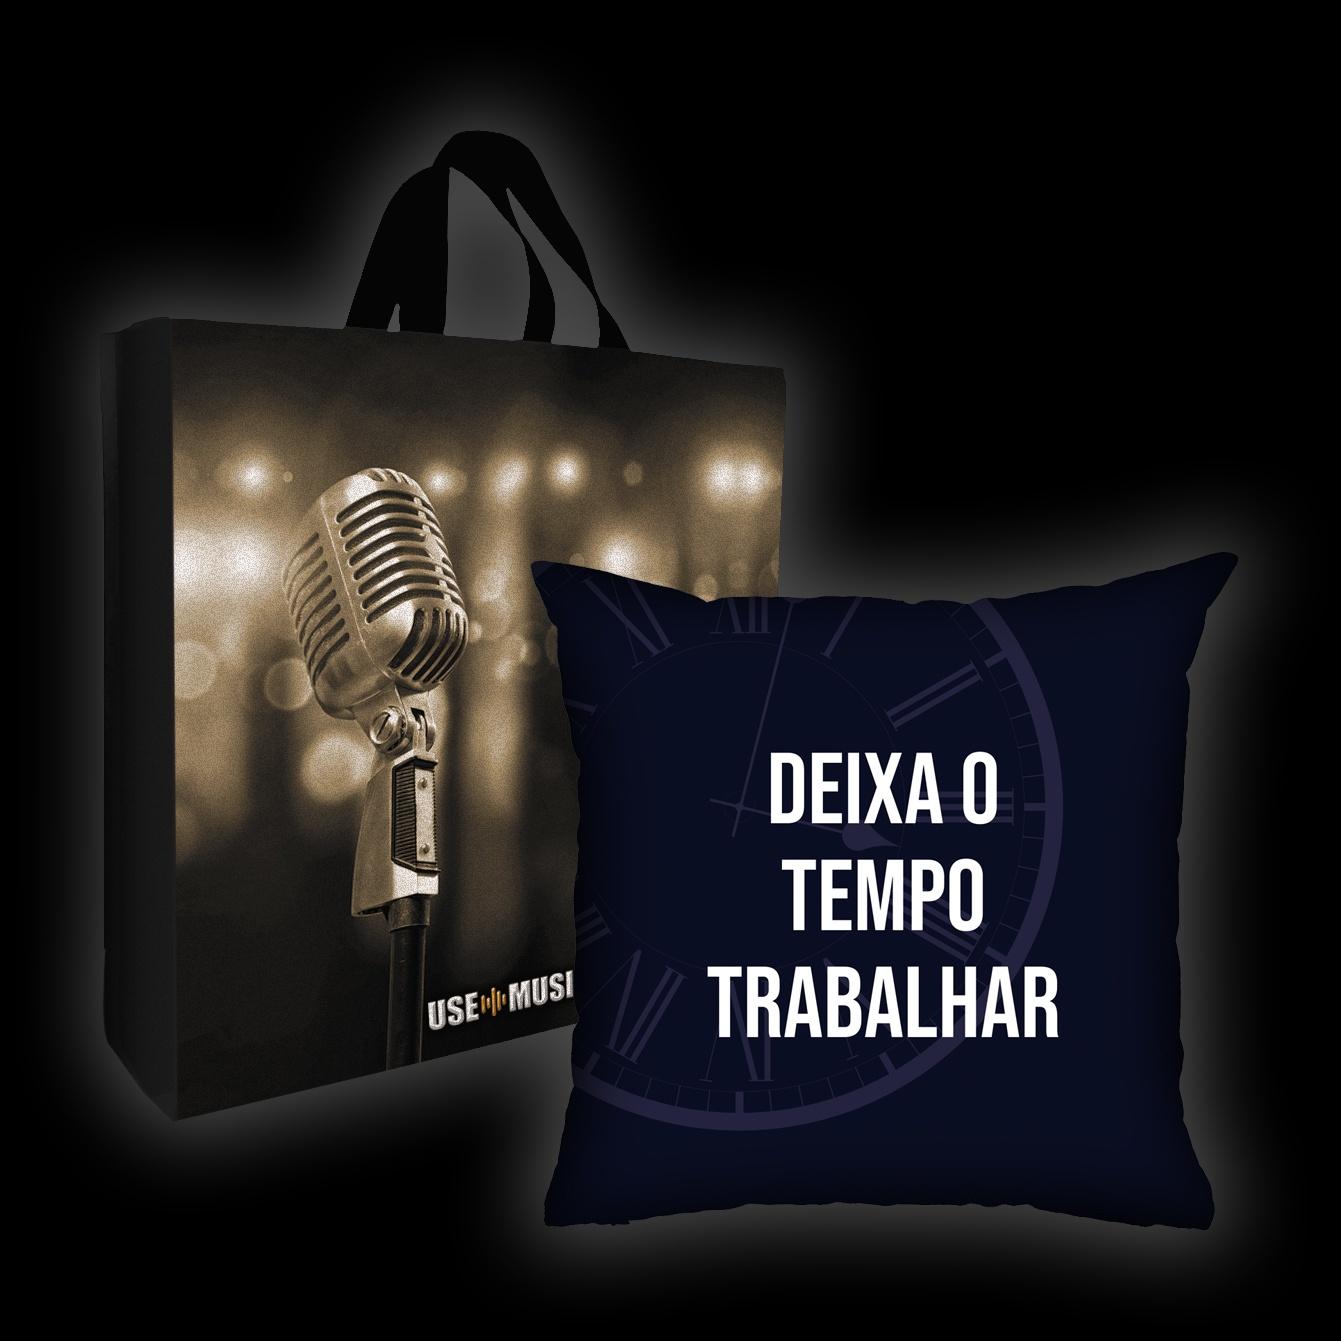 Kit Almofada + Sacola João Suplicy - Deixa o Tempo Trabalhar